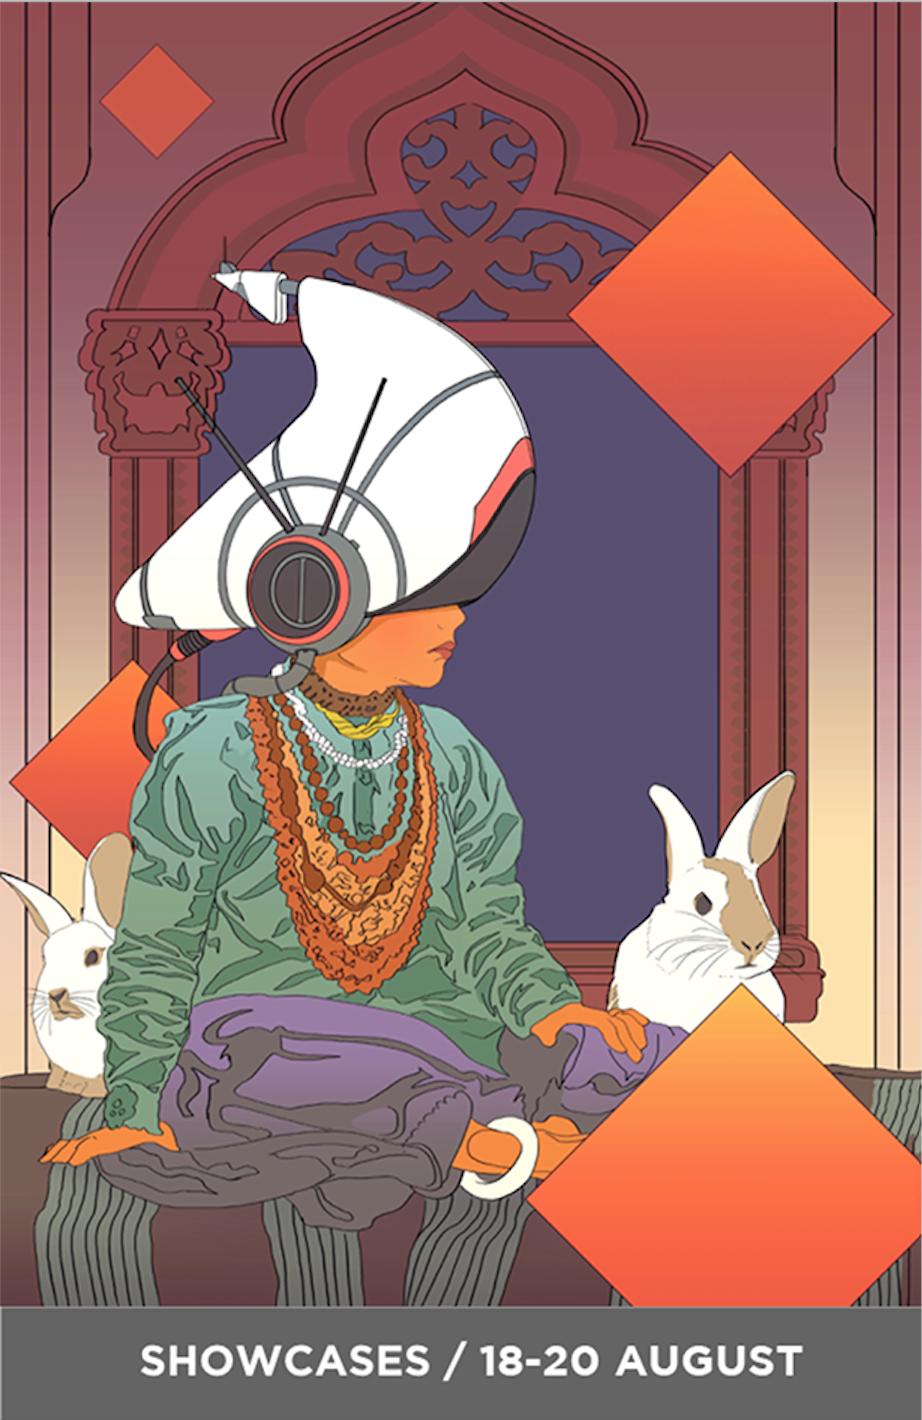 Eyemyth 2017 Poster